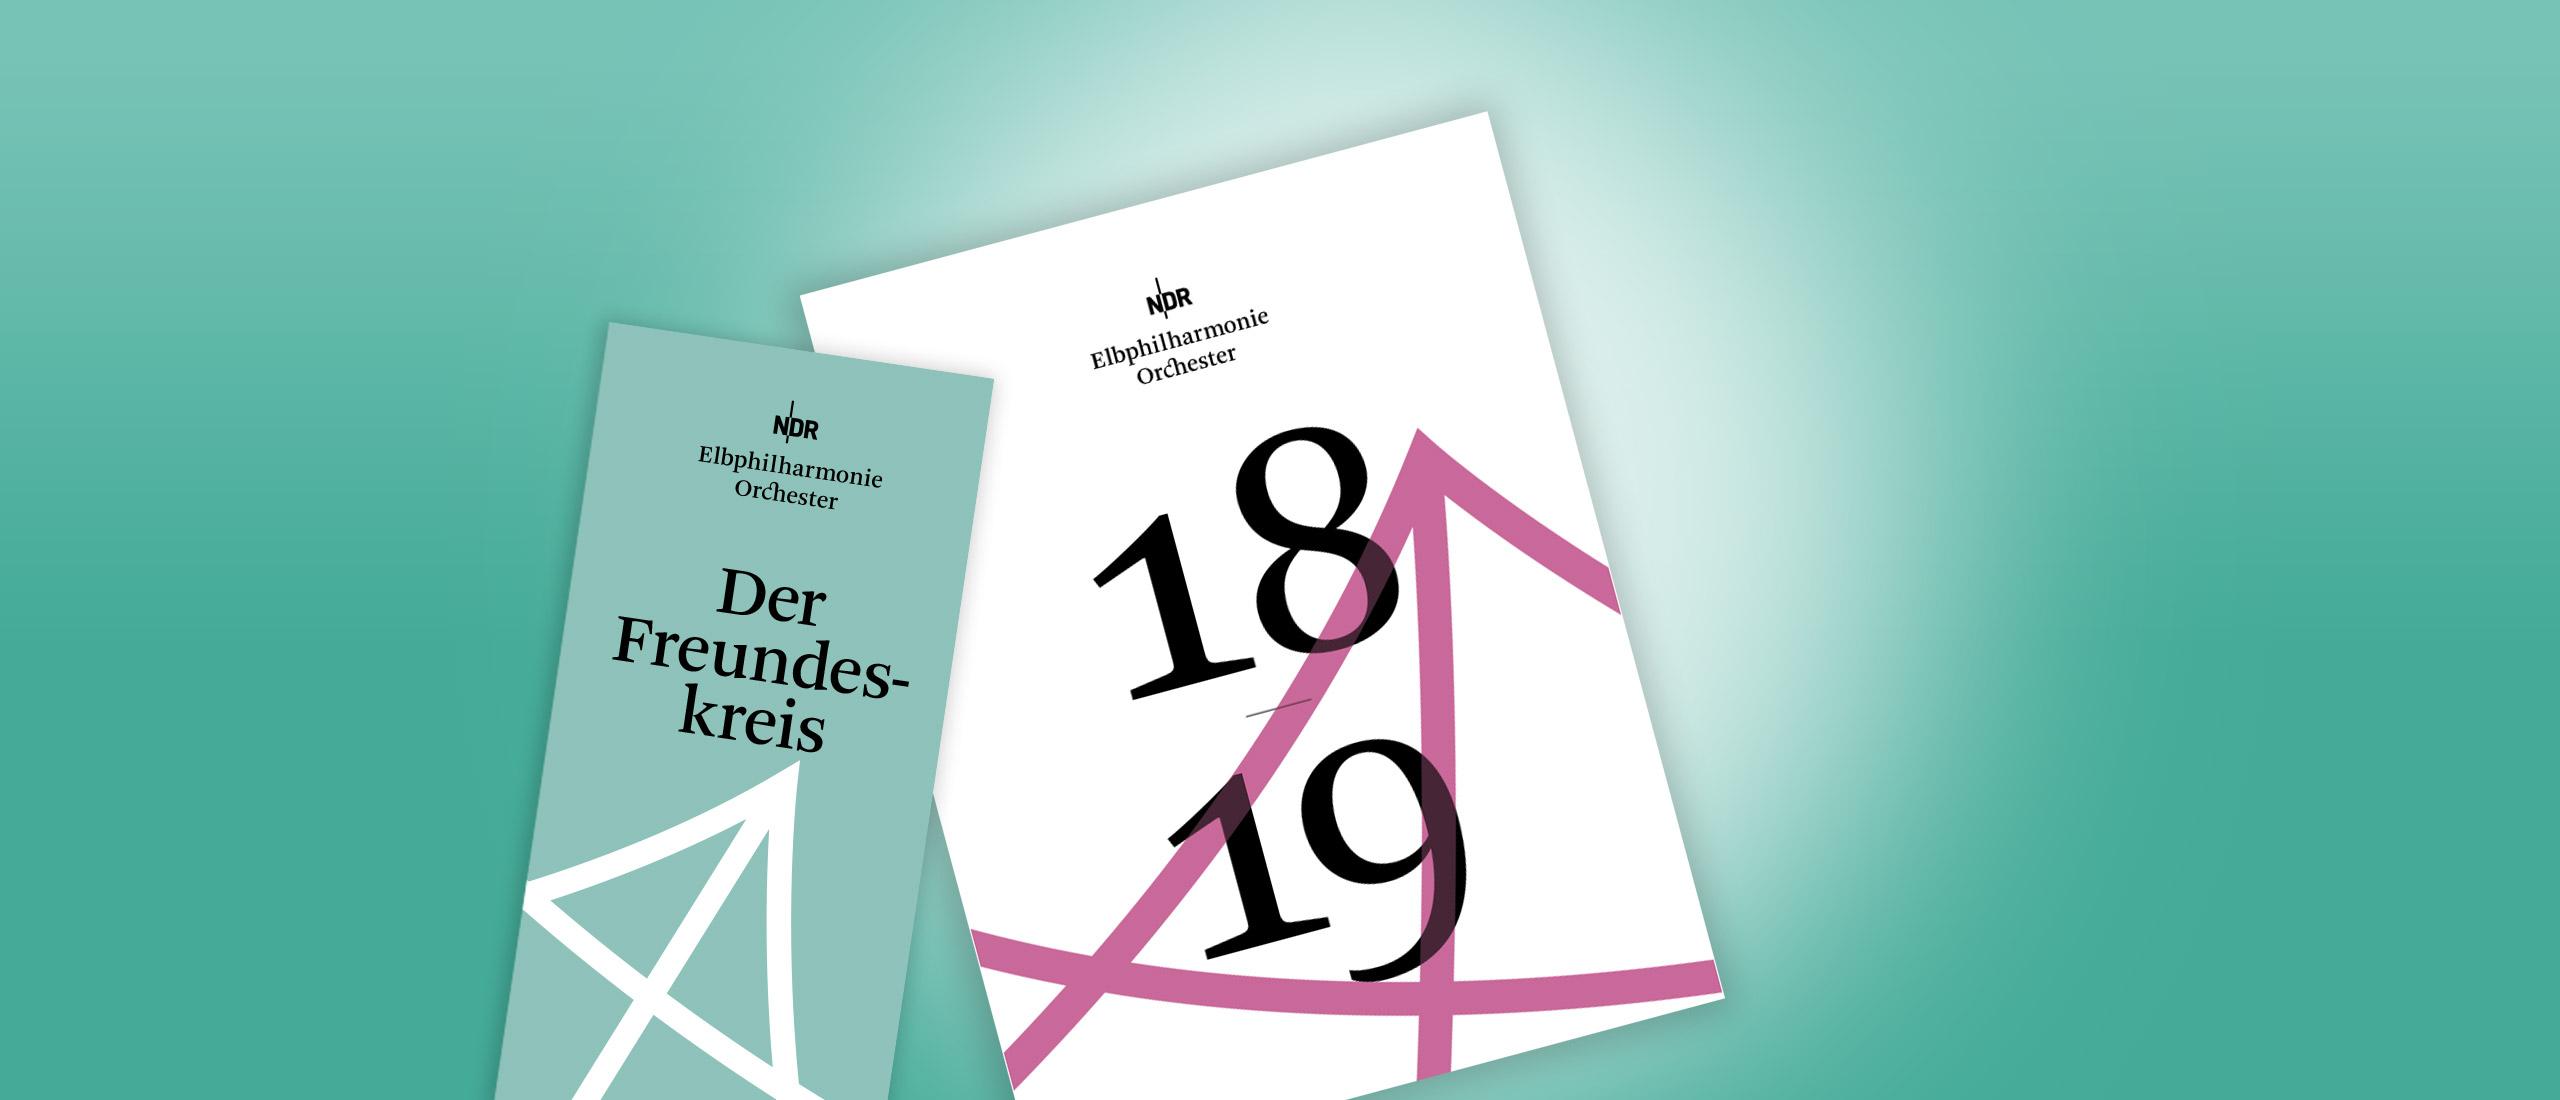 Der Freundeskreis - NDR Elbphilharmonie Orchester - Aktuelles